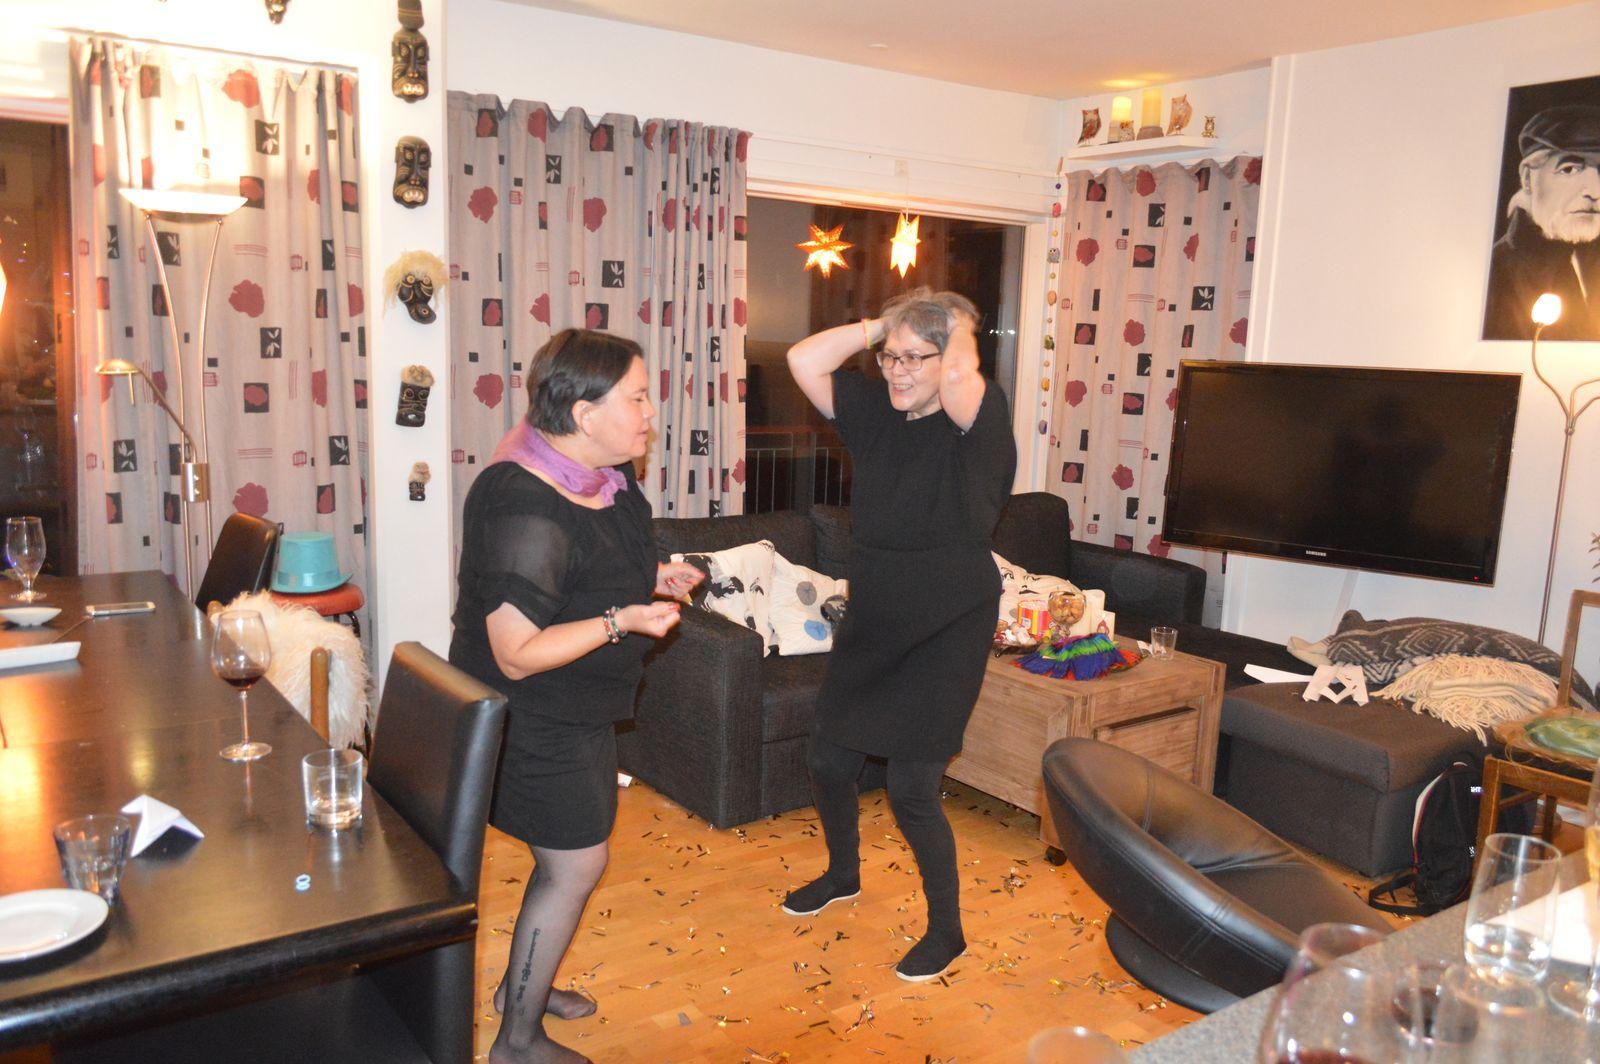 2020-01-01-0218_Anna-Hessler-Labansen-Juliane-Burmeister